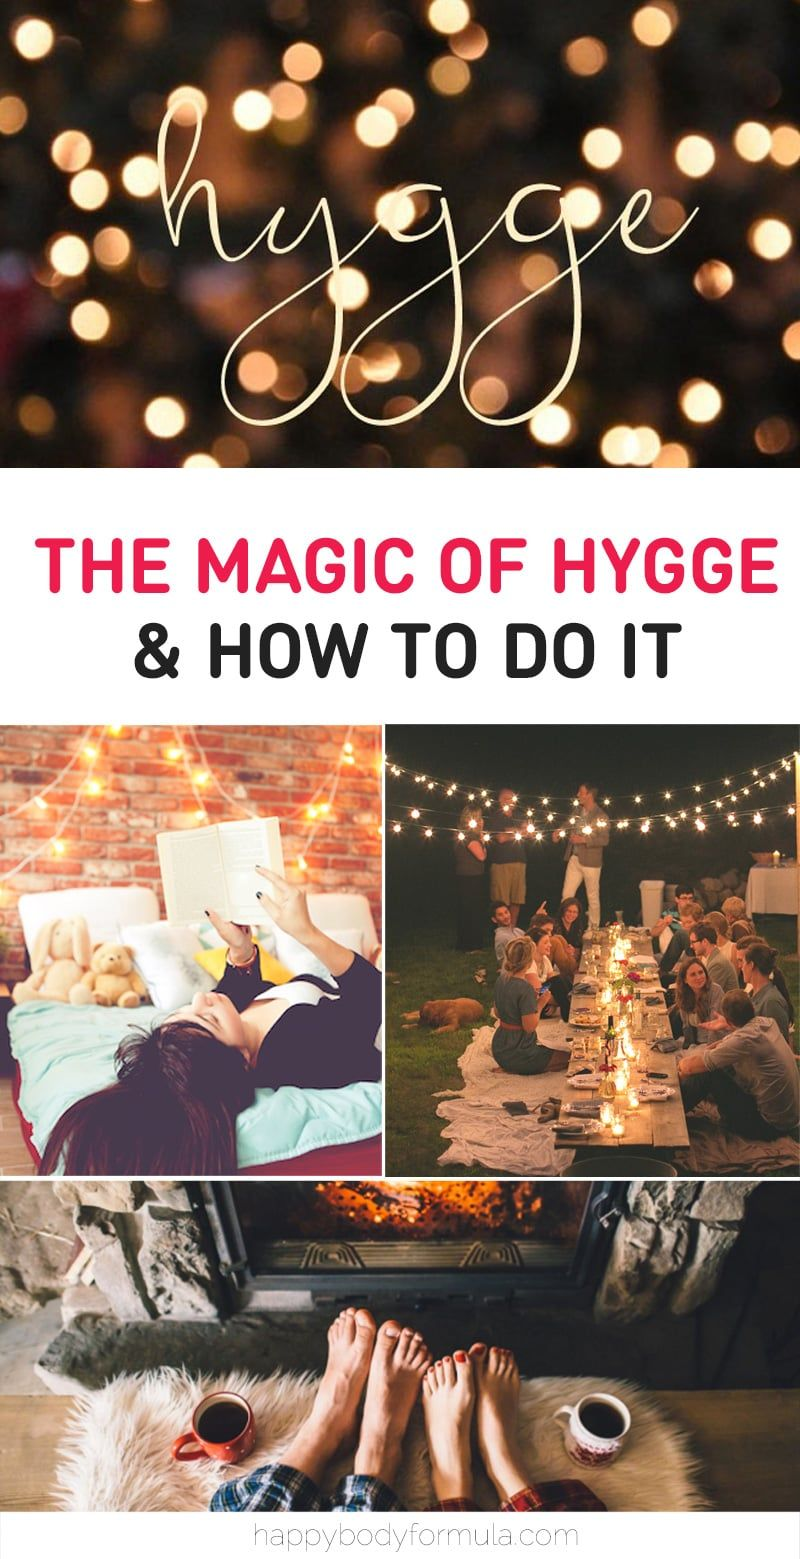 8 Ways to Hygge -The Danish Art Of Happiness – Happy Body Formula